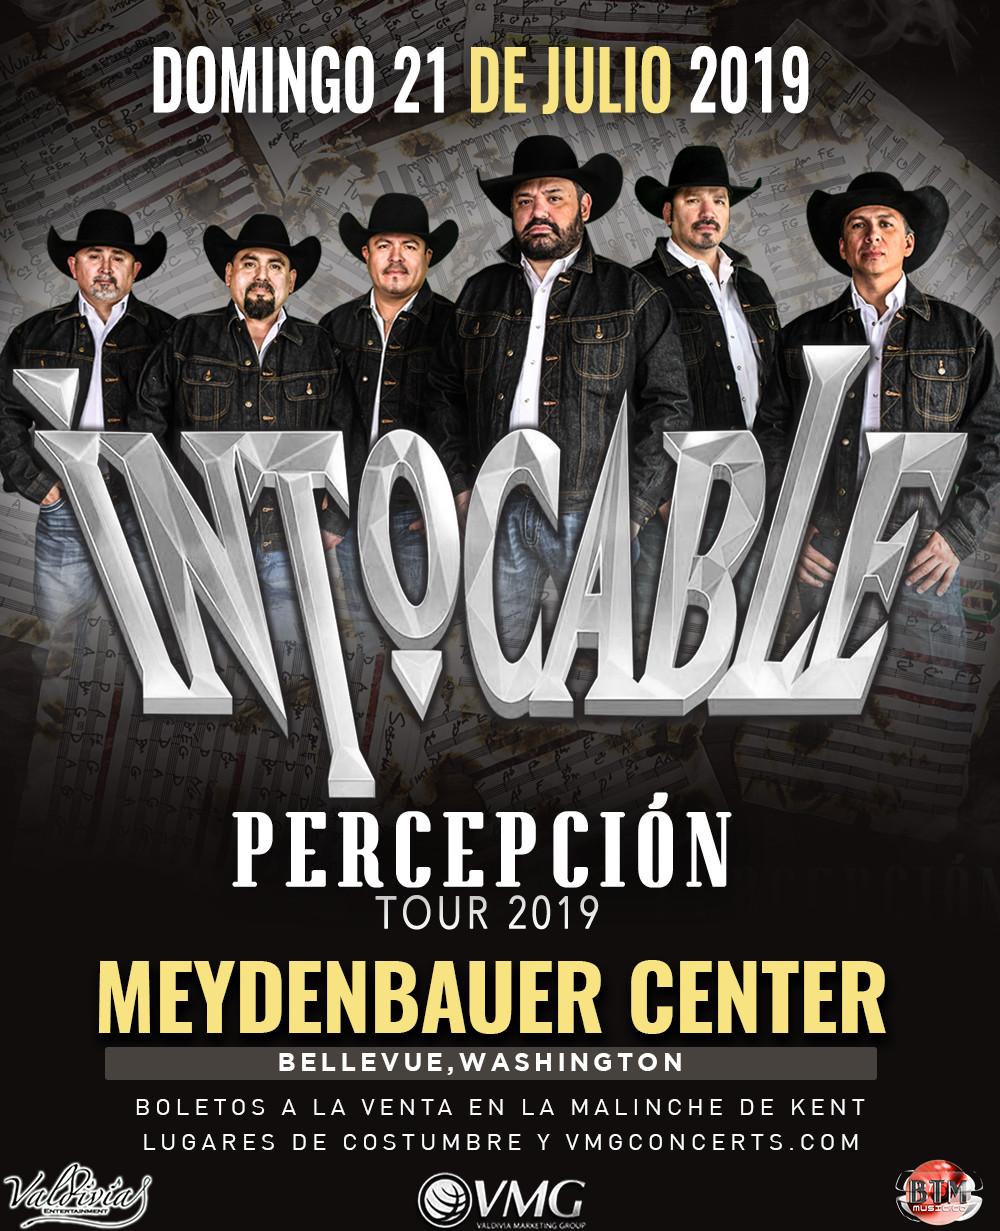 Intocable – Percepción Tour 2019 – Meydenbauer Center – Bellevue, WA